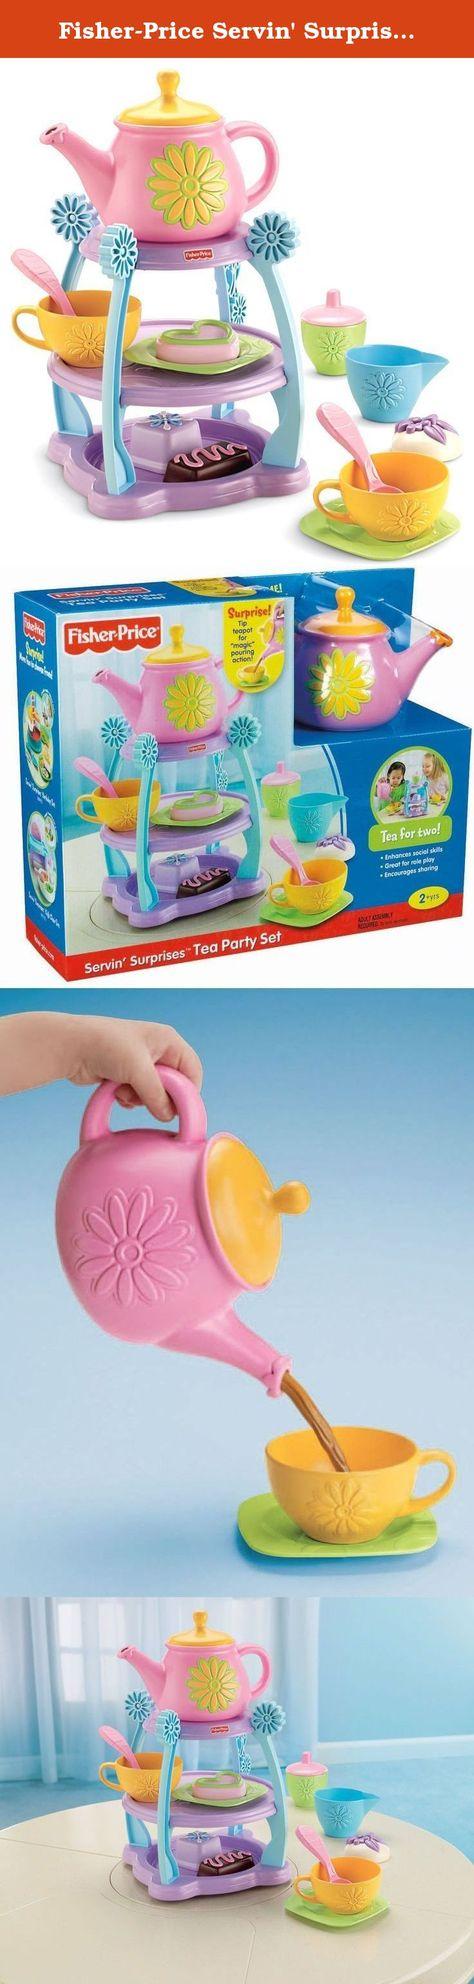 39 pcs Picnic Party Kitchen Toy Play Set Bright Colors Children Girls Plastic Di